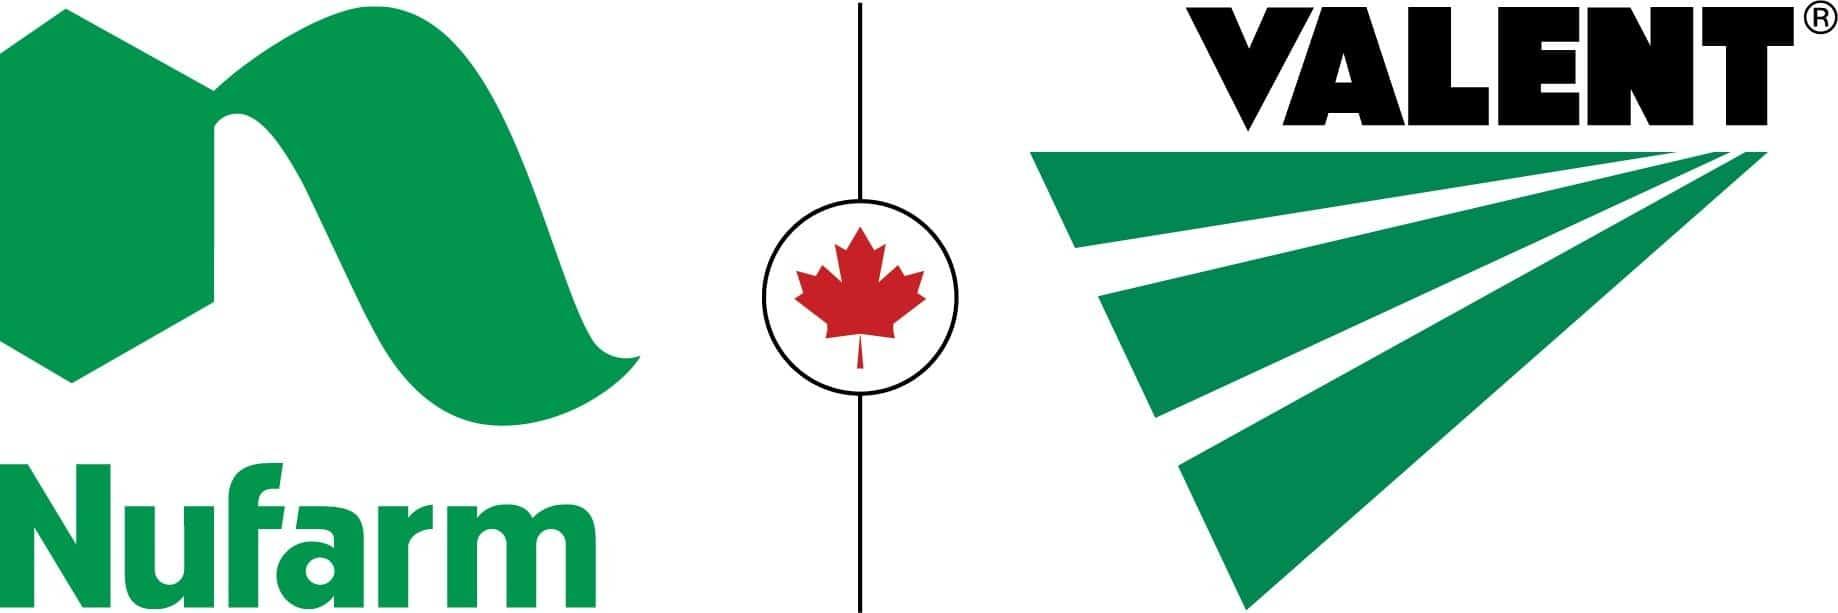 NuFarm Valent logo